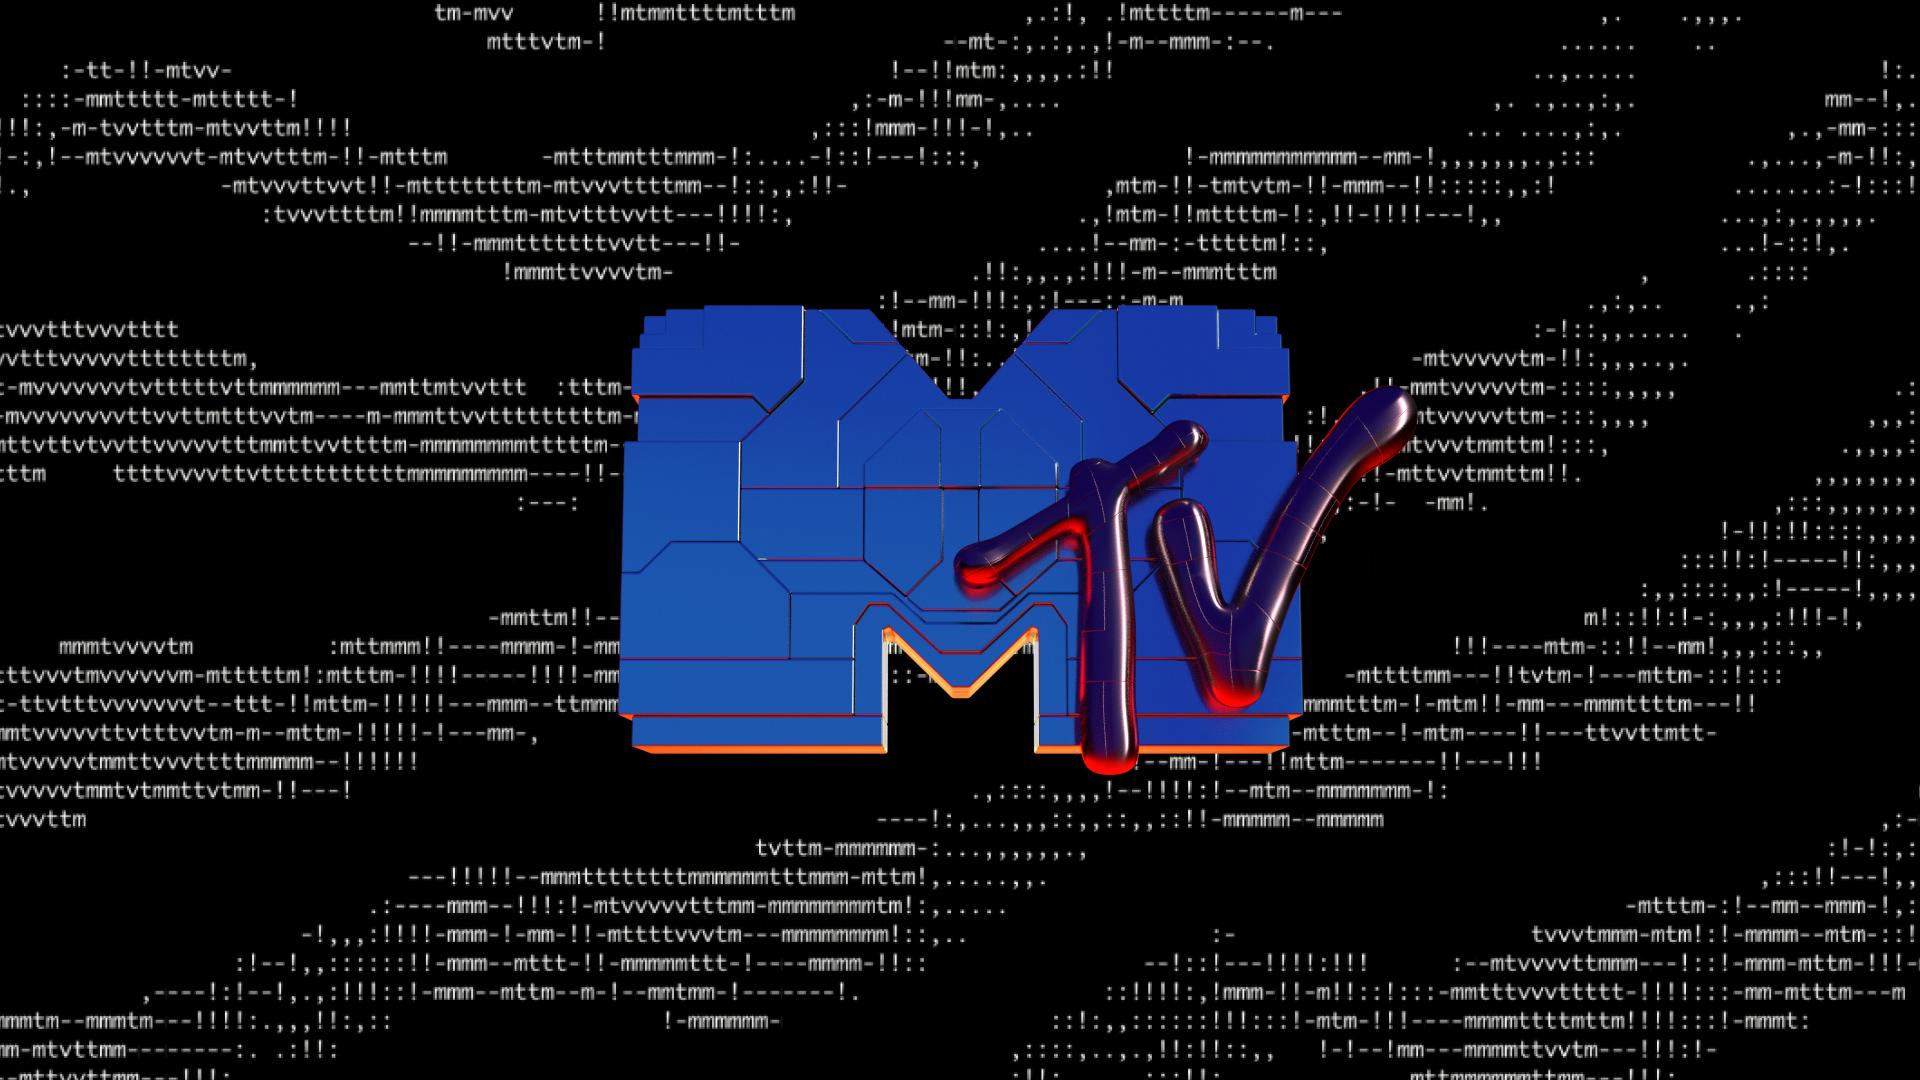 MTV_OS_LOGO_2